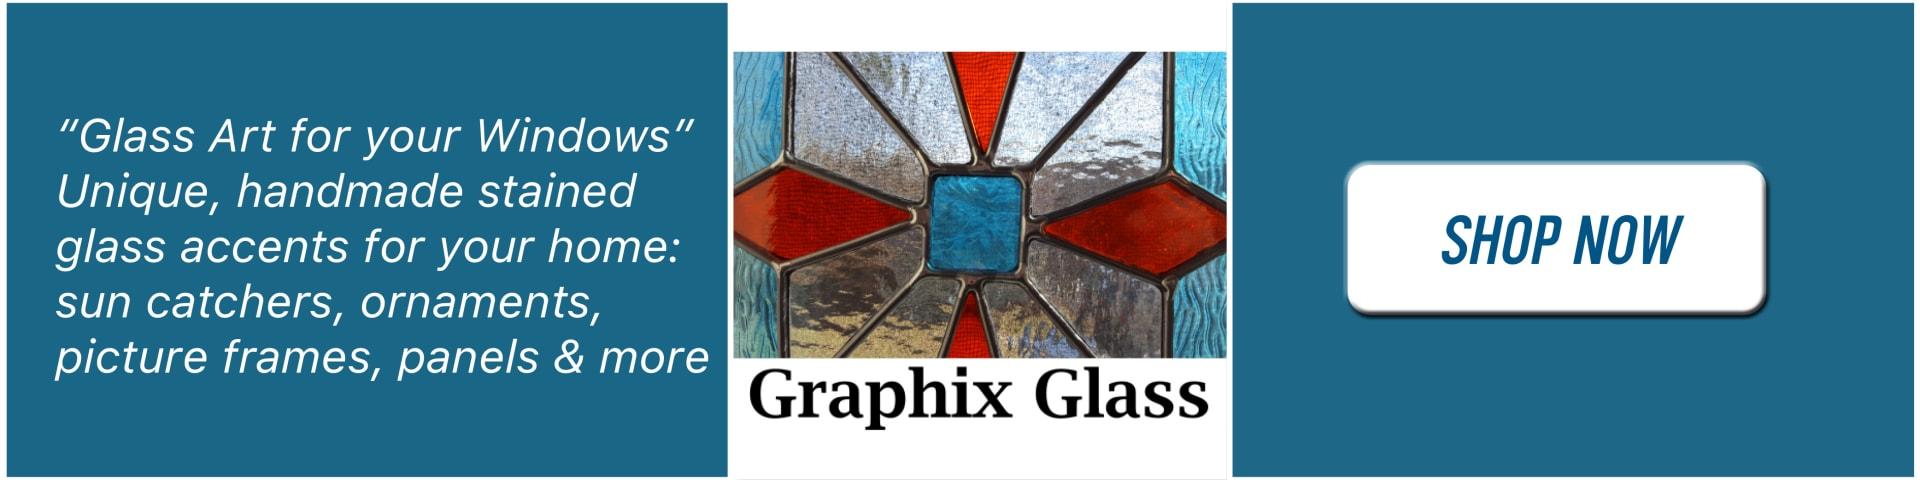 Graphix-Glass-Banner-w1920.jpg